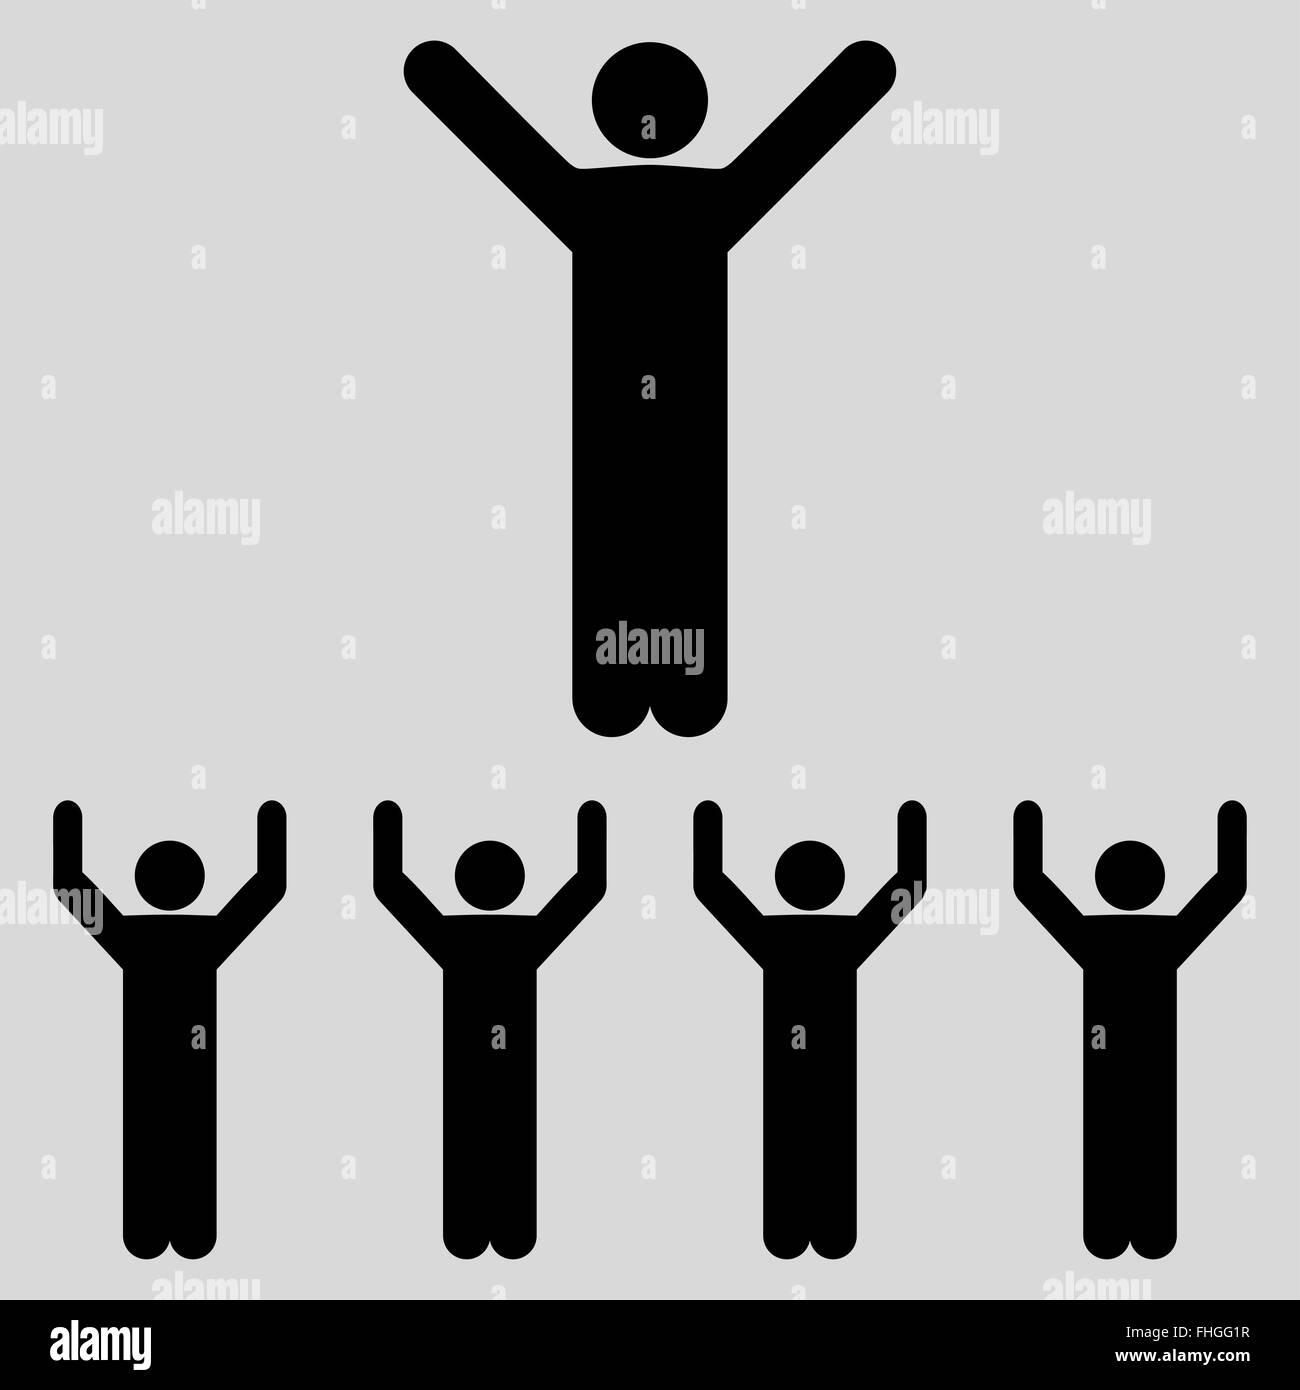 Religion icon - Stock Image